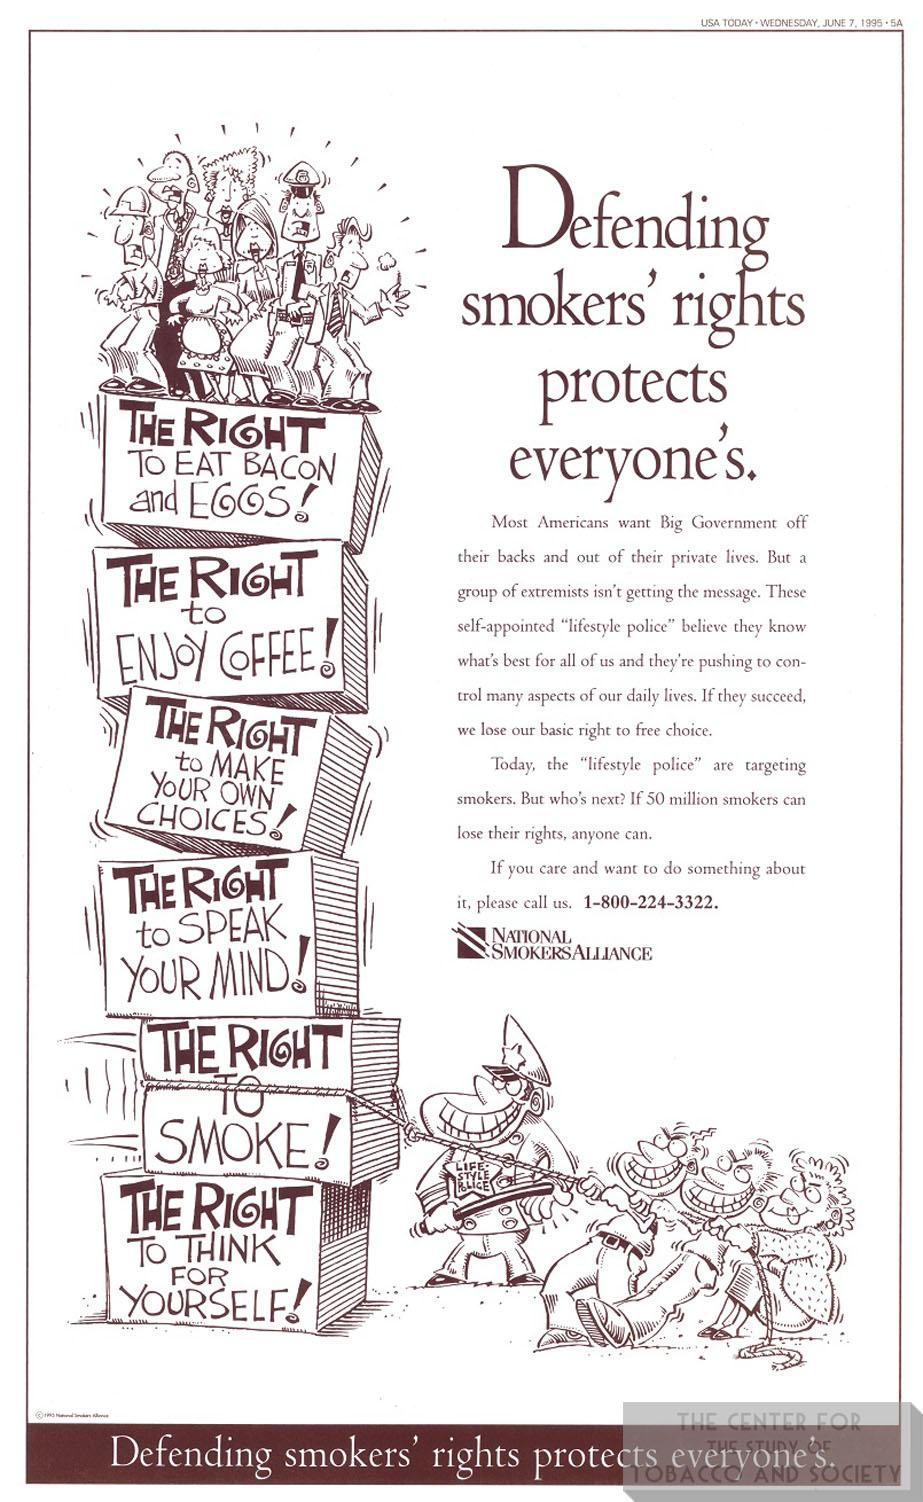 1995 06 07 USA Today Natl Smokers Alliance Ad 1